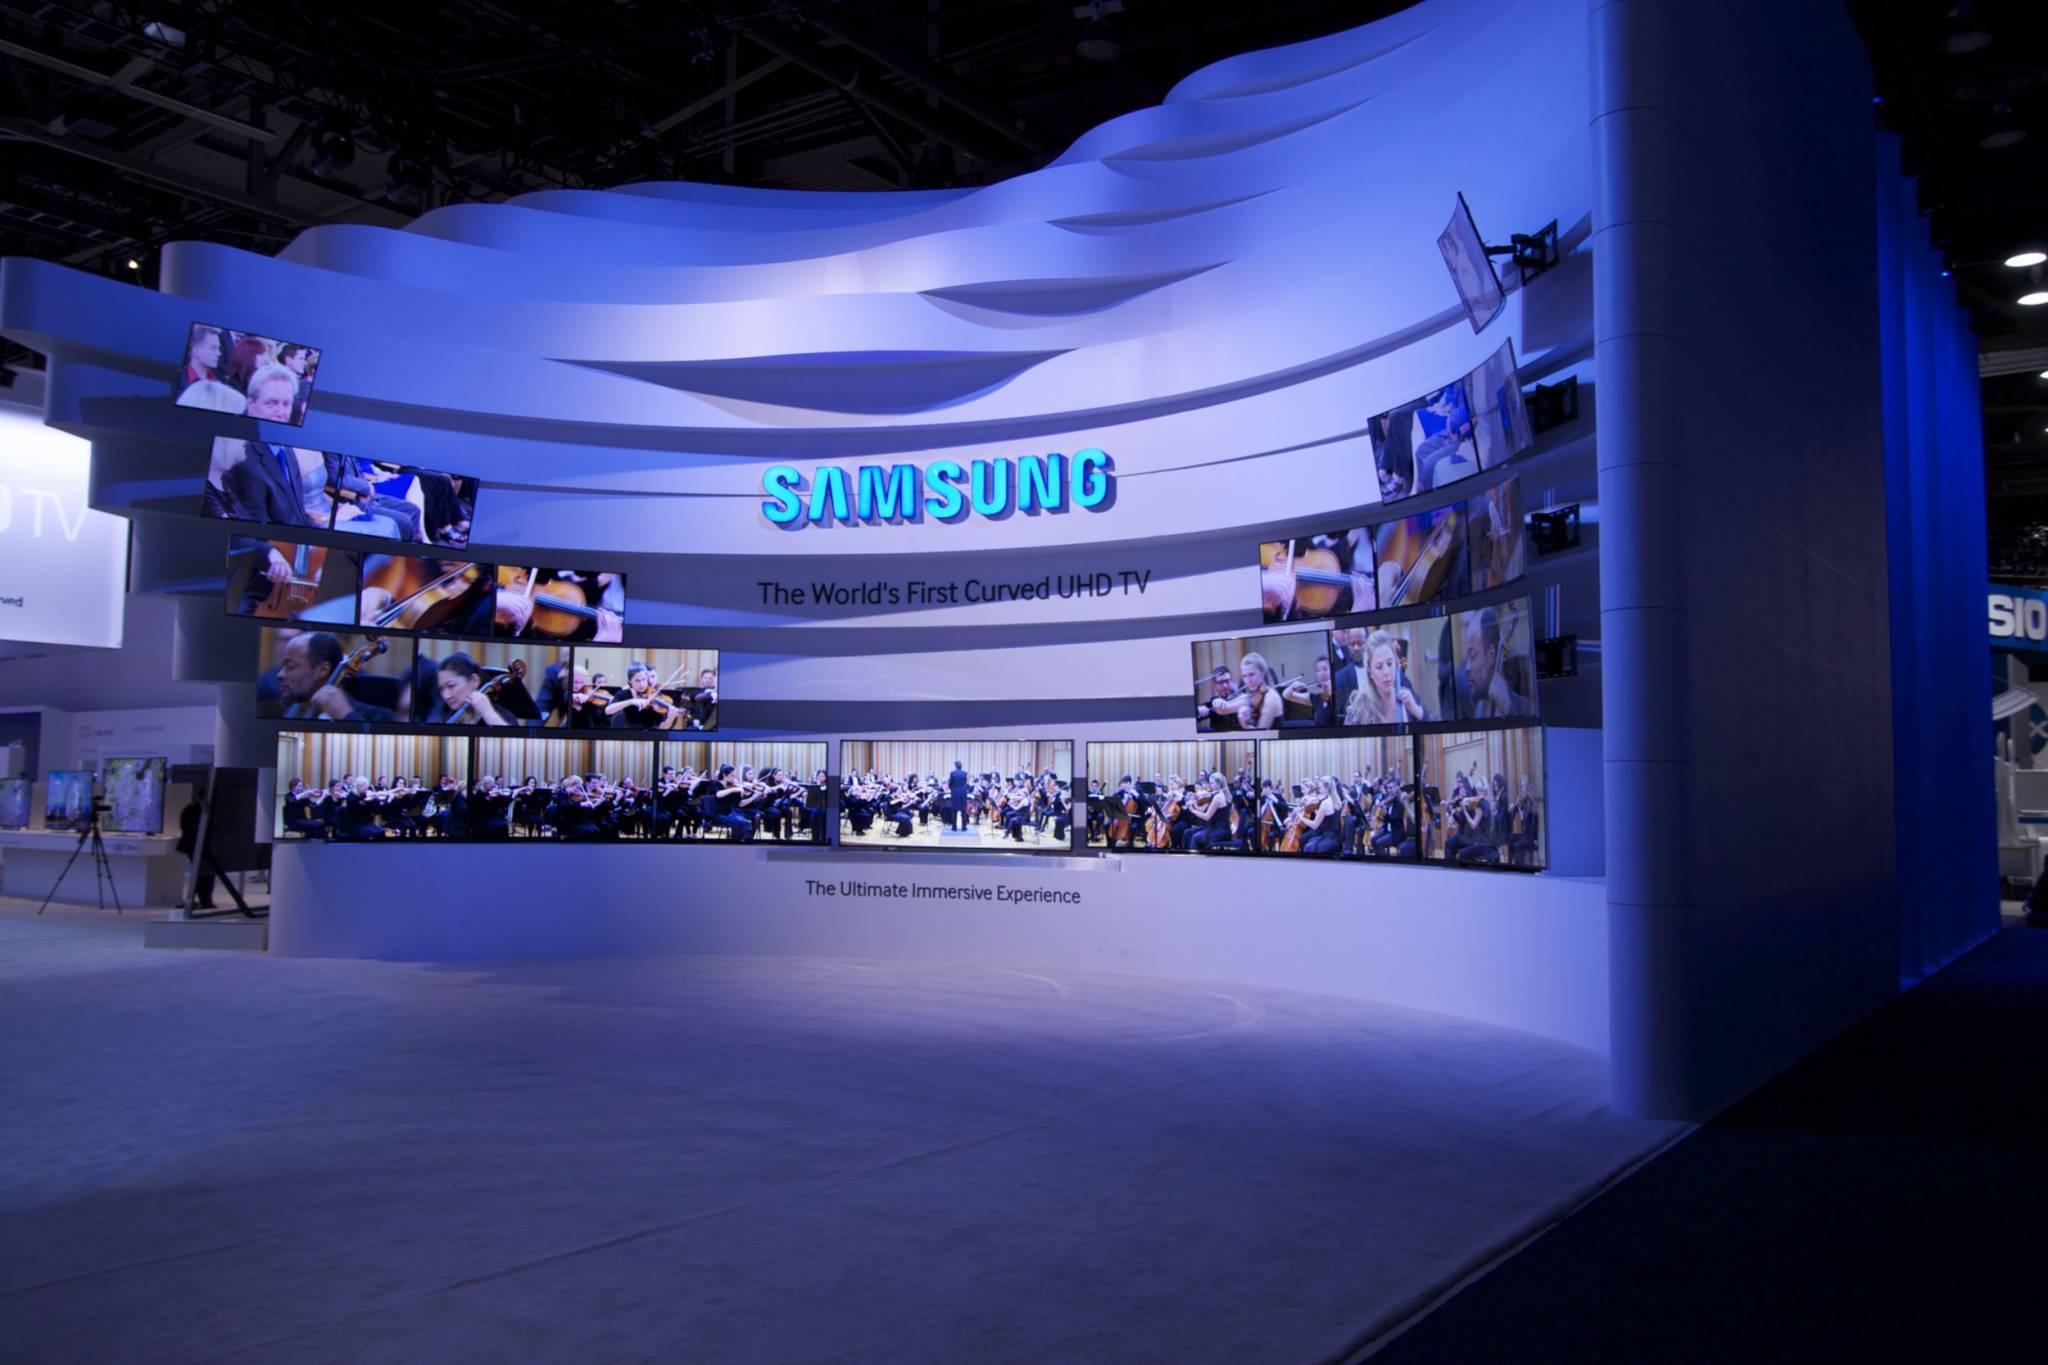 Samsung Exhibition Booth Design : Ces samsung exhibit fine design associates